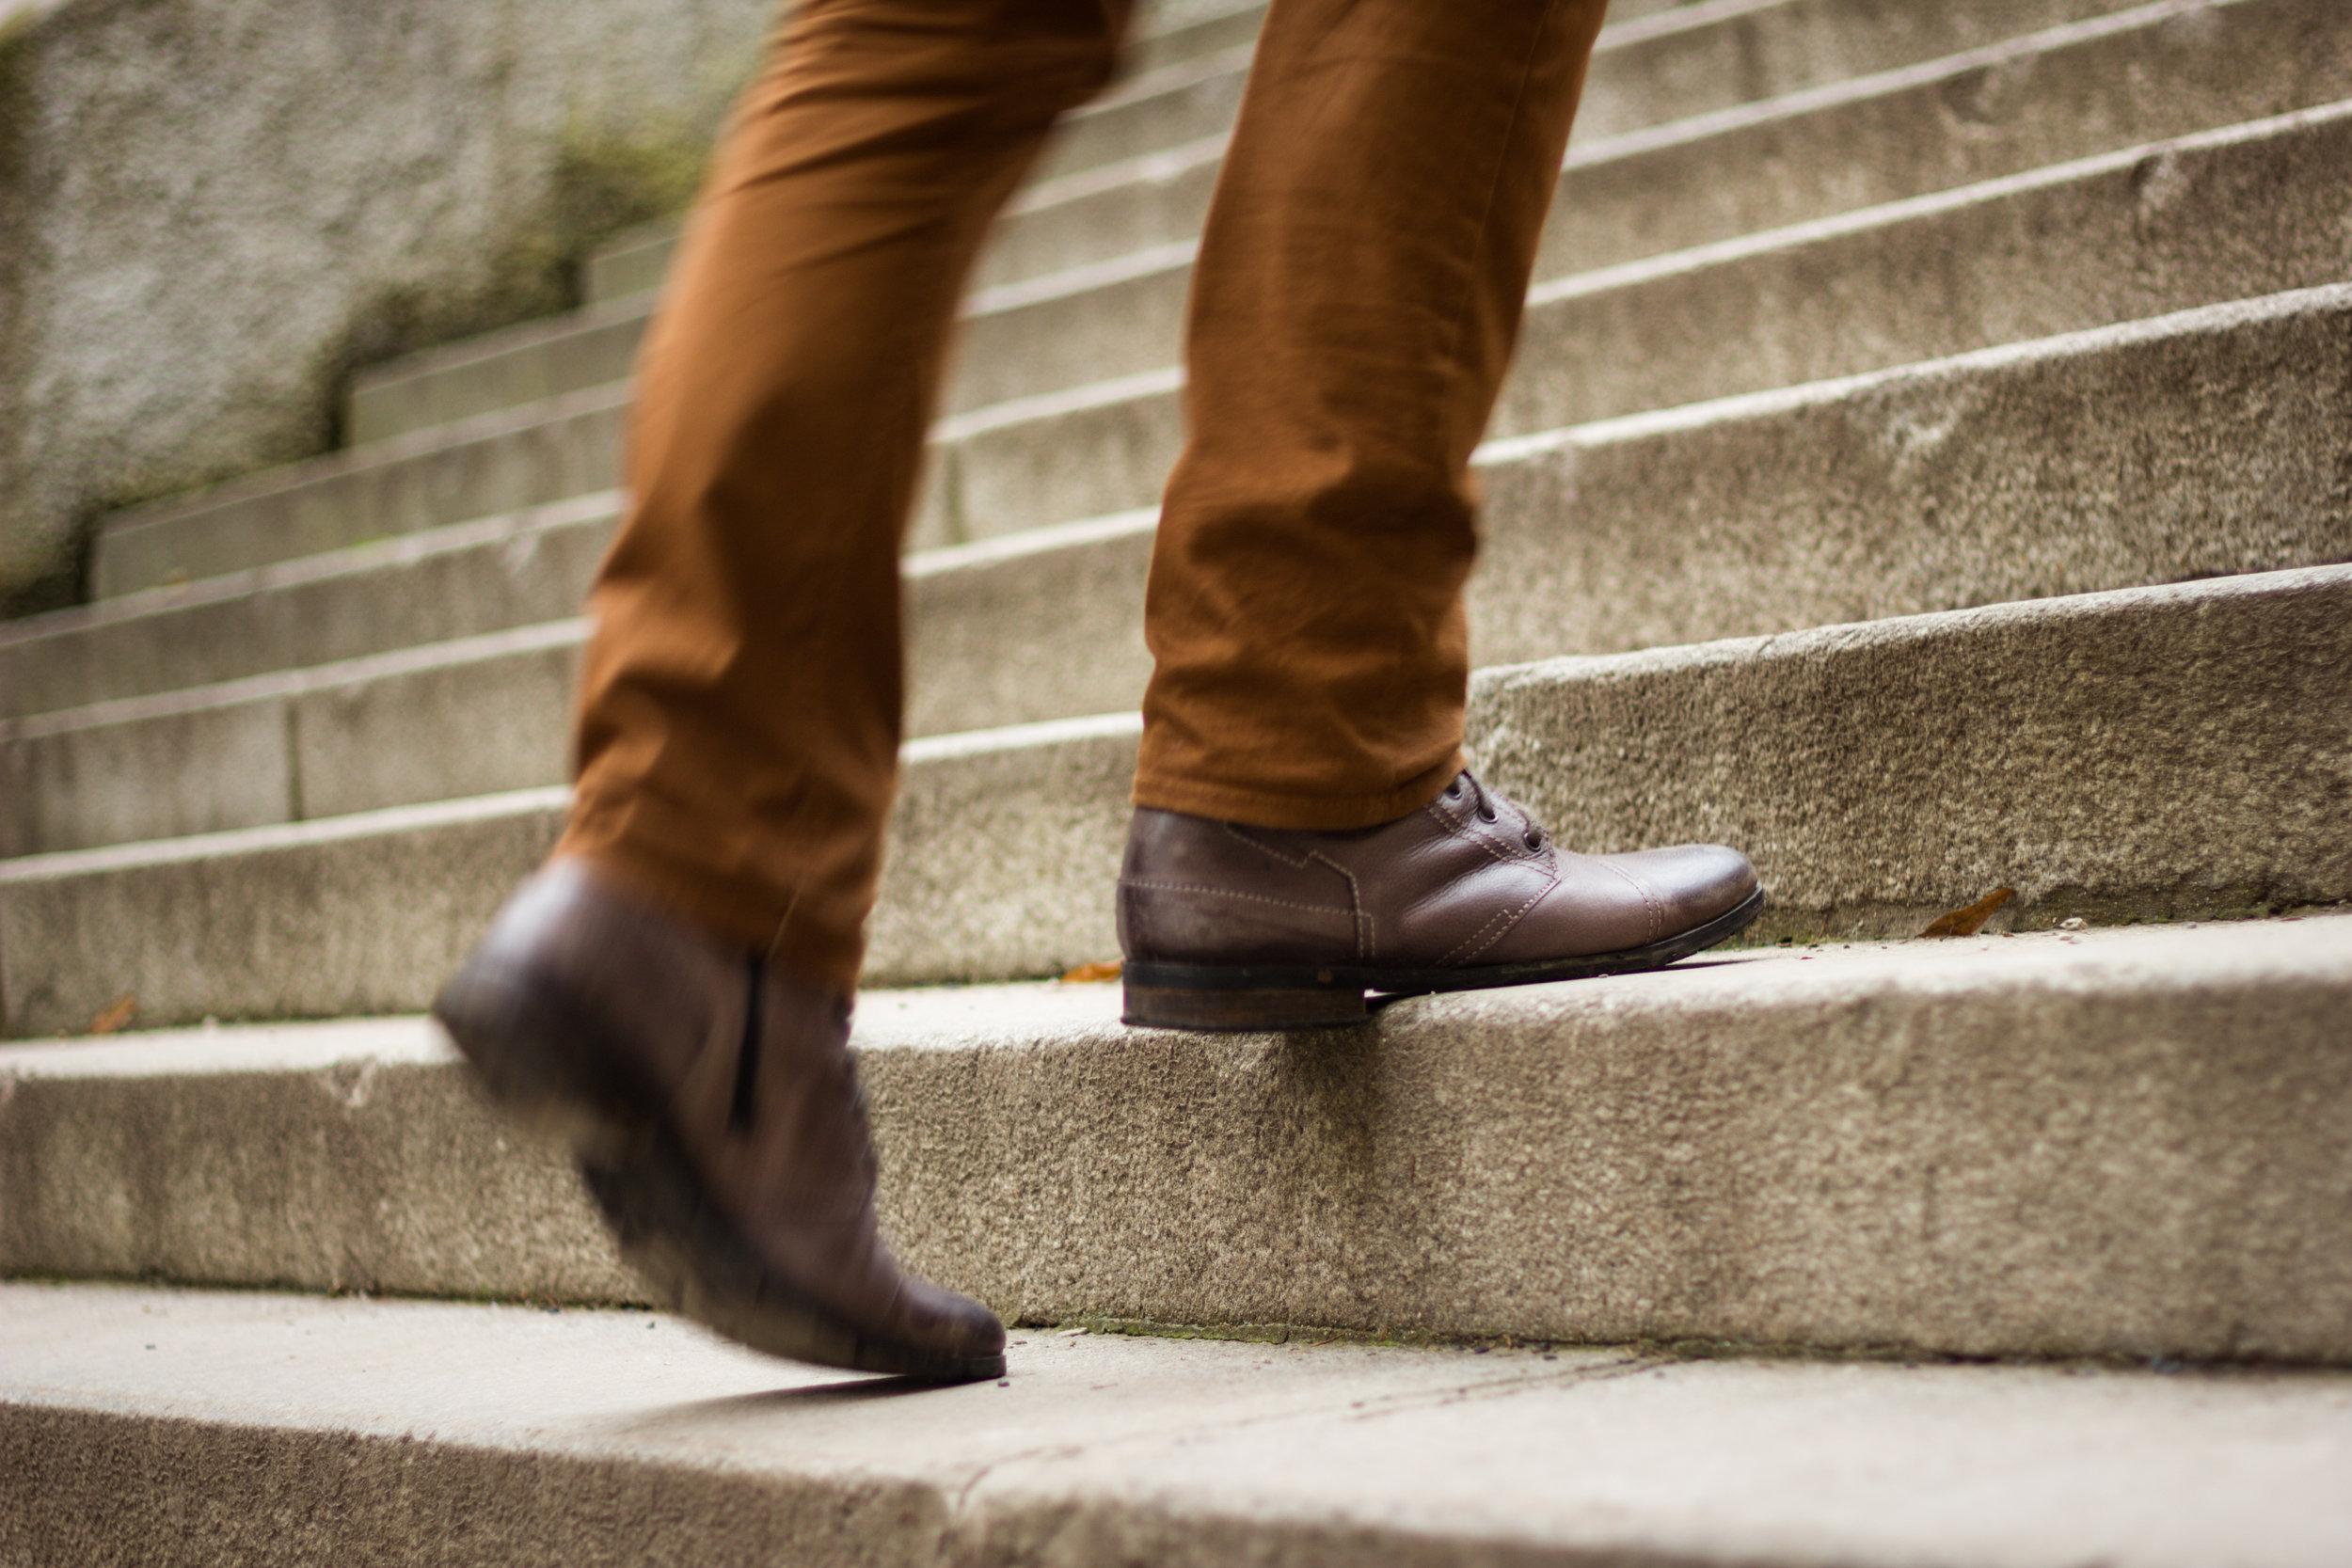 Walk up steps shutterstock_171334631.jpg